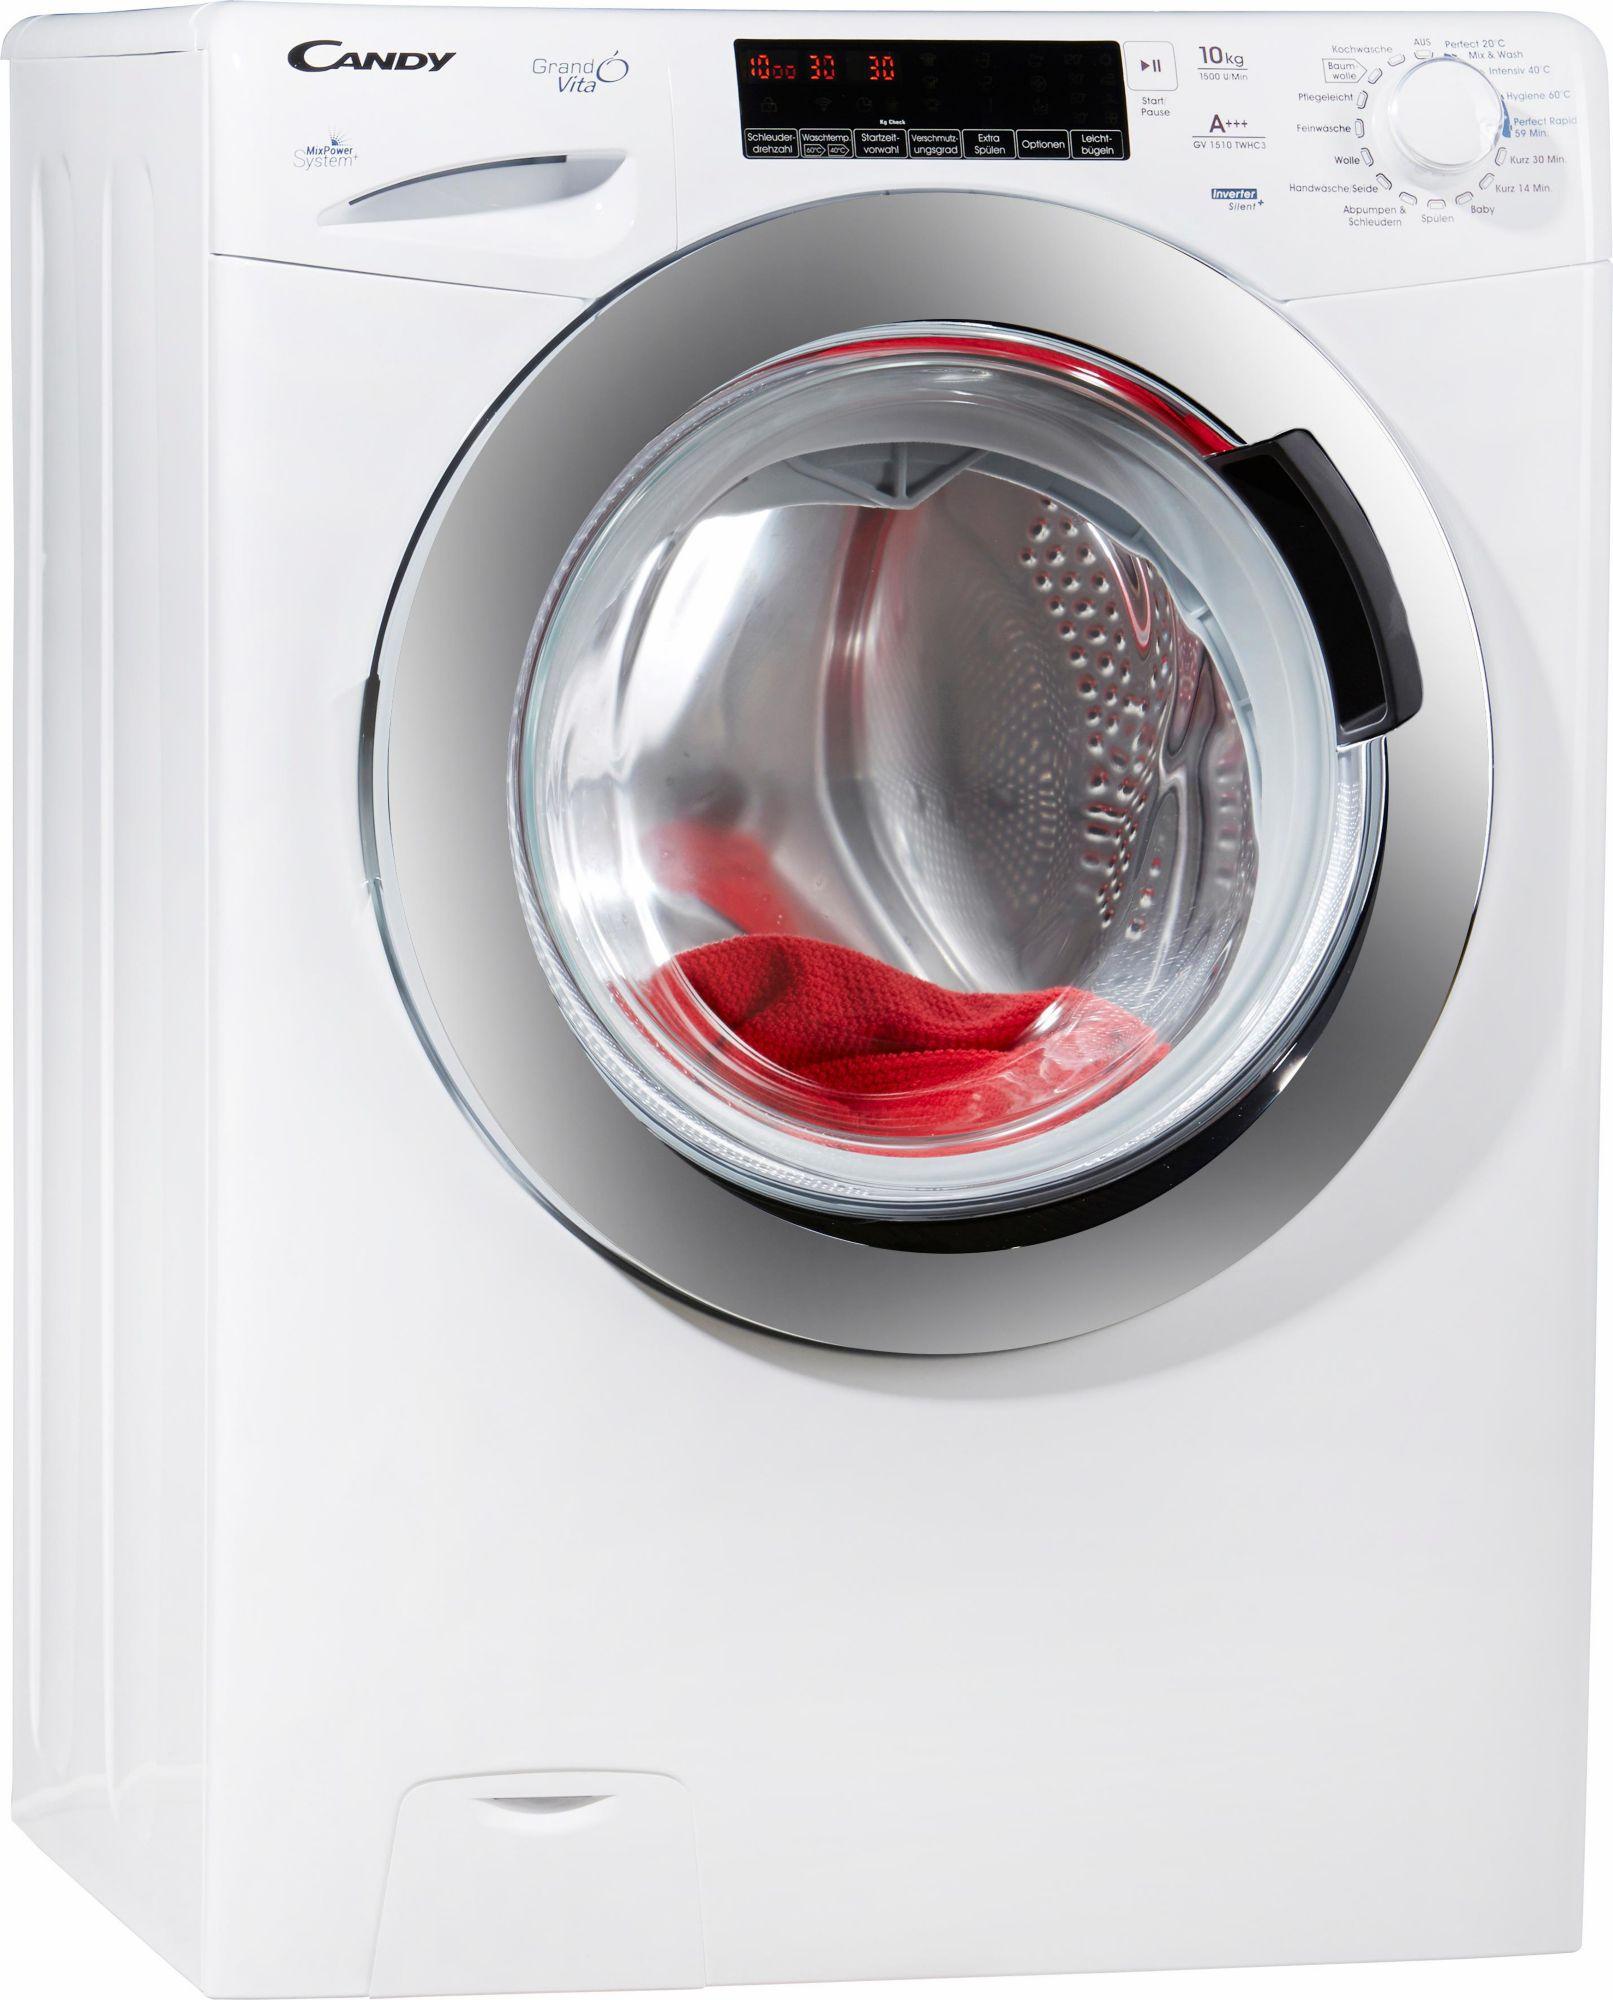 CANDY Candy Waschmaschine GV 1510 TWHC 3, A+++, 10 kg, 1500 U/Min